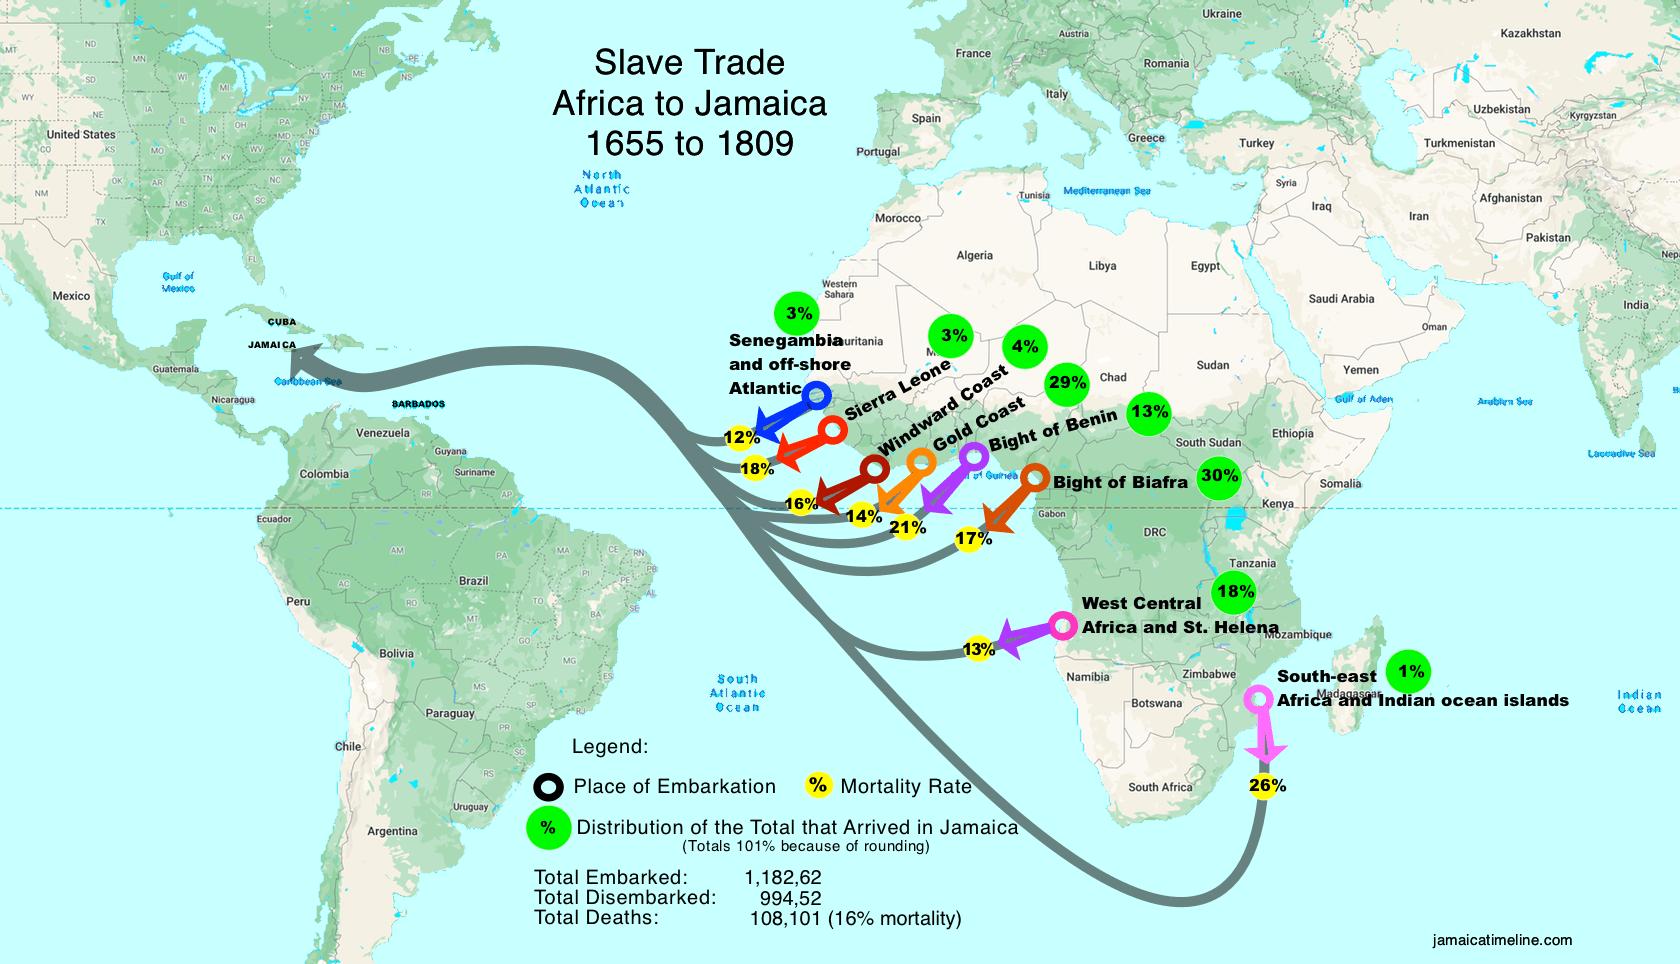 the slave trade route